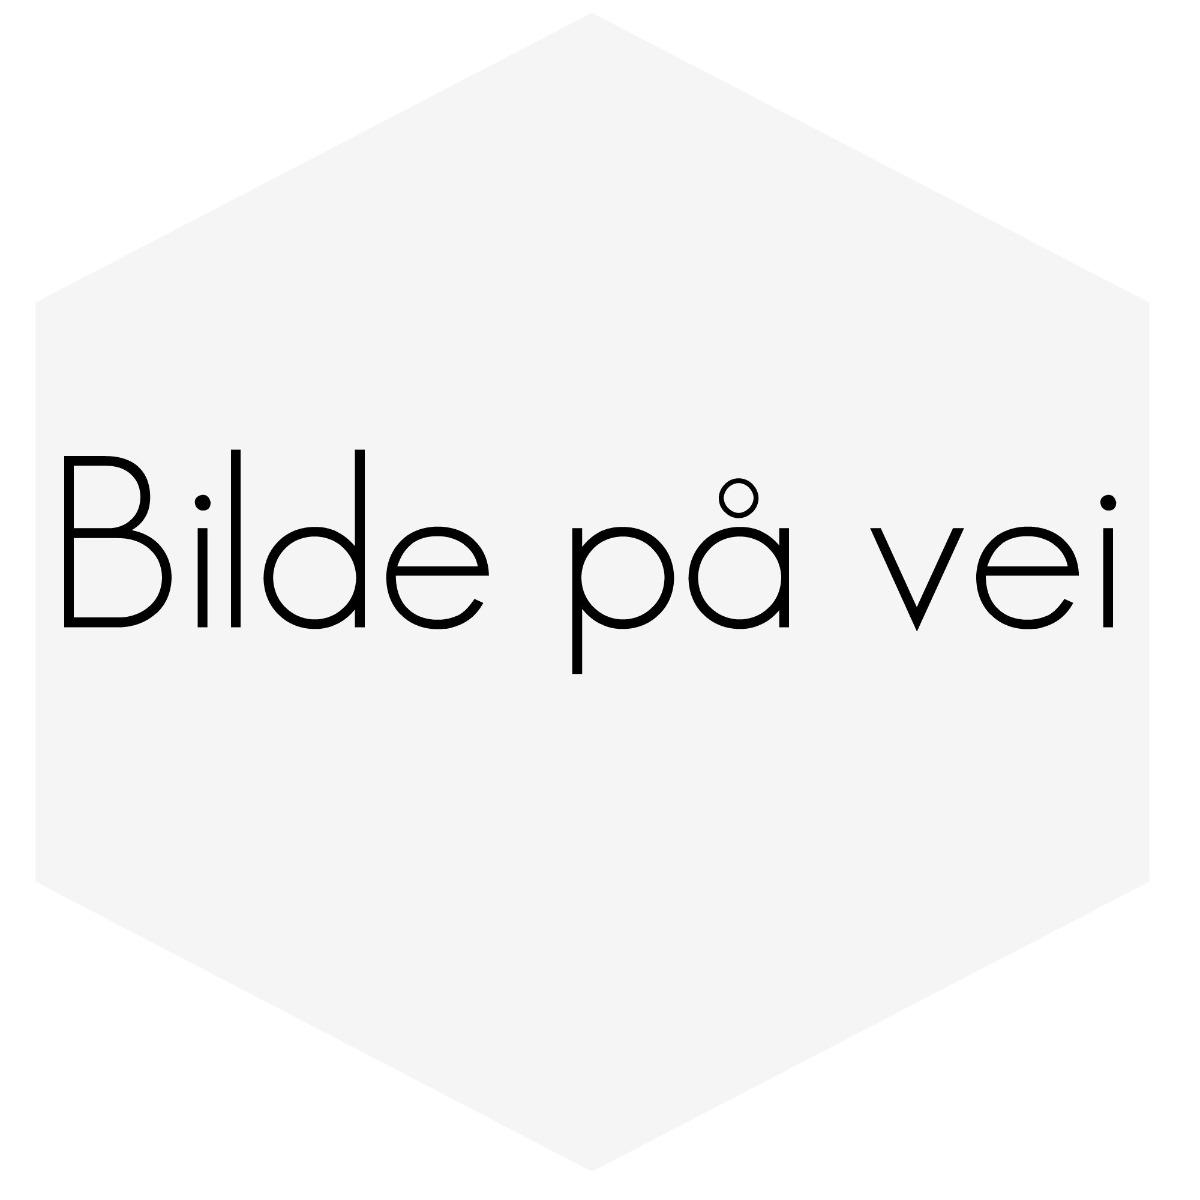 "SILIKONSLANGE RØD REDUSERING 1-1,5"" (25-38MM)"